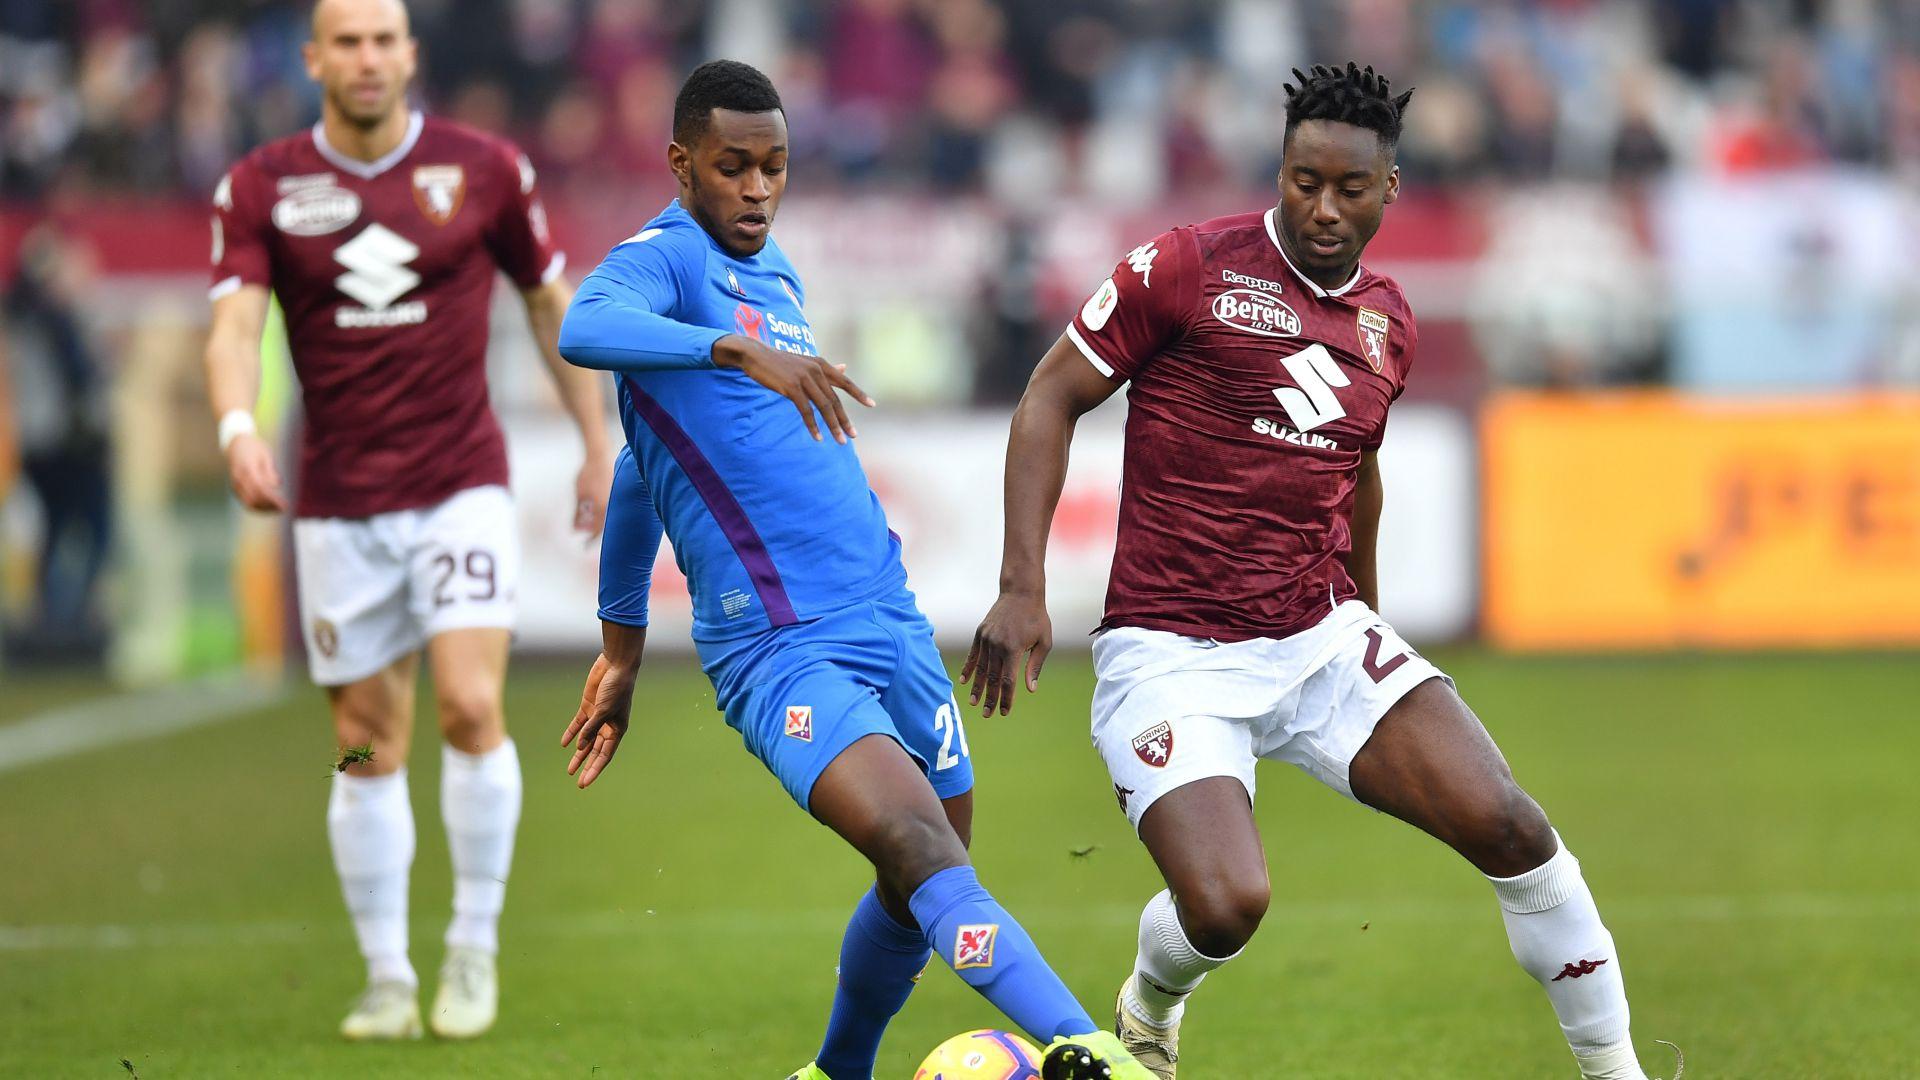 Edimilson Fernandes Soualiho Meite Torino Fiorentina Coppa Italia